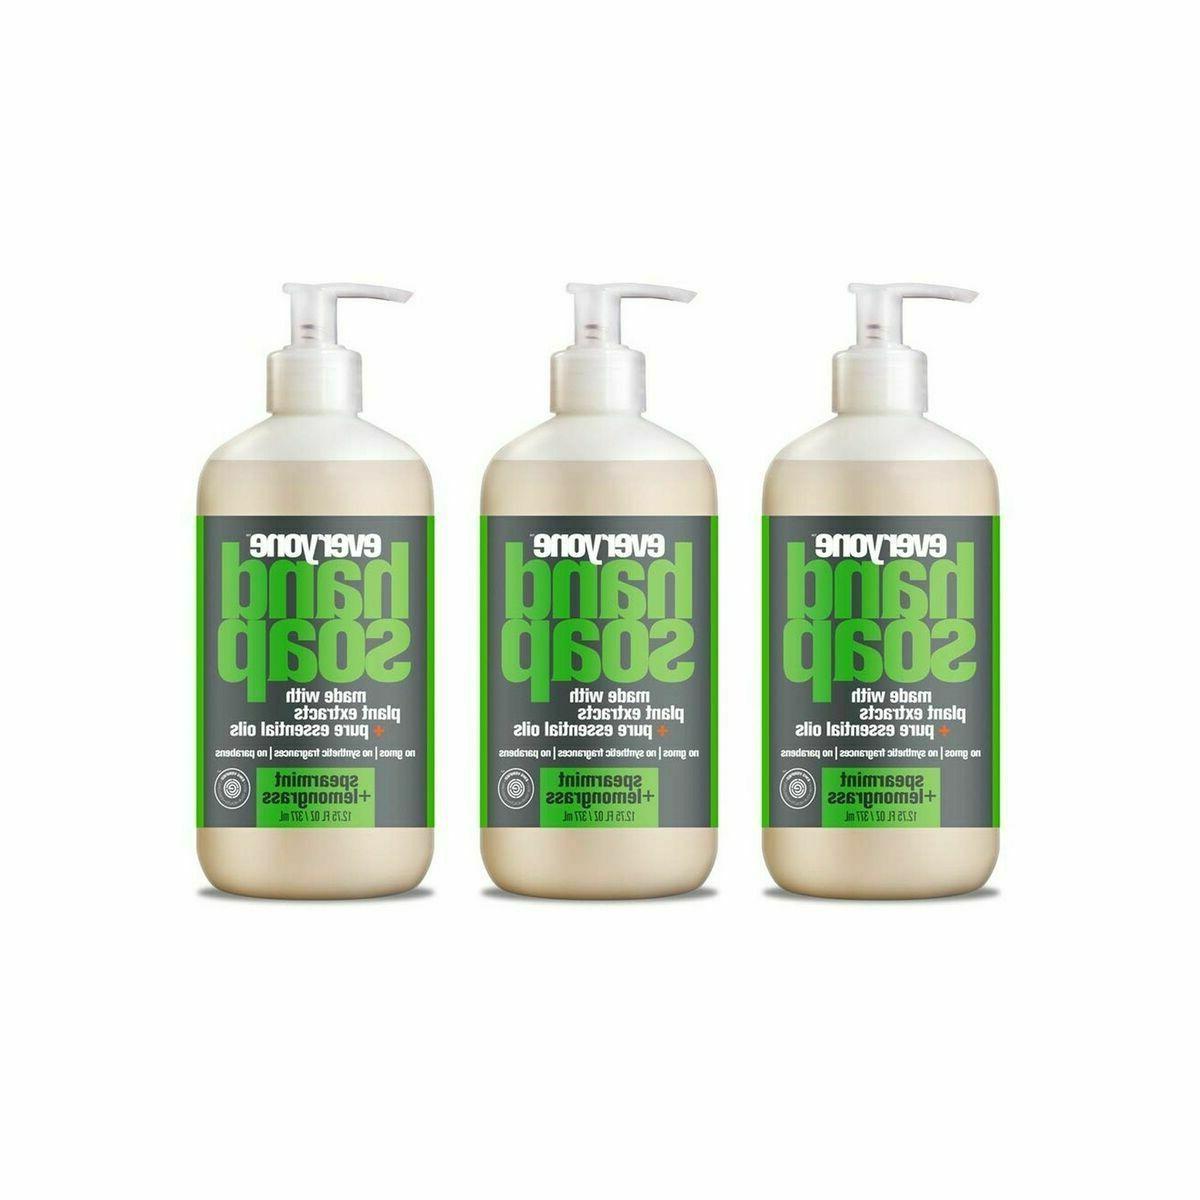 Everyone Hand Soap: Spearmint and Lemongrass, 12.75 Ounce, 3